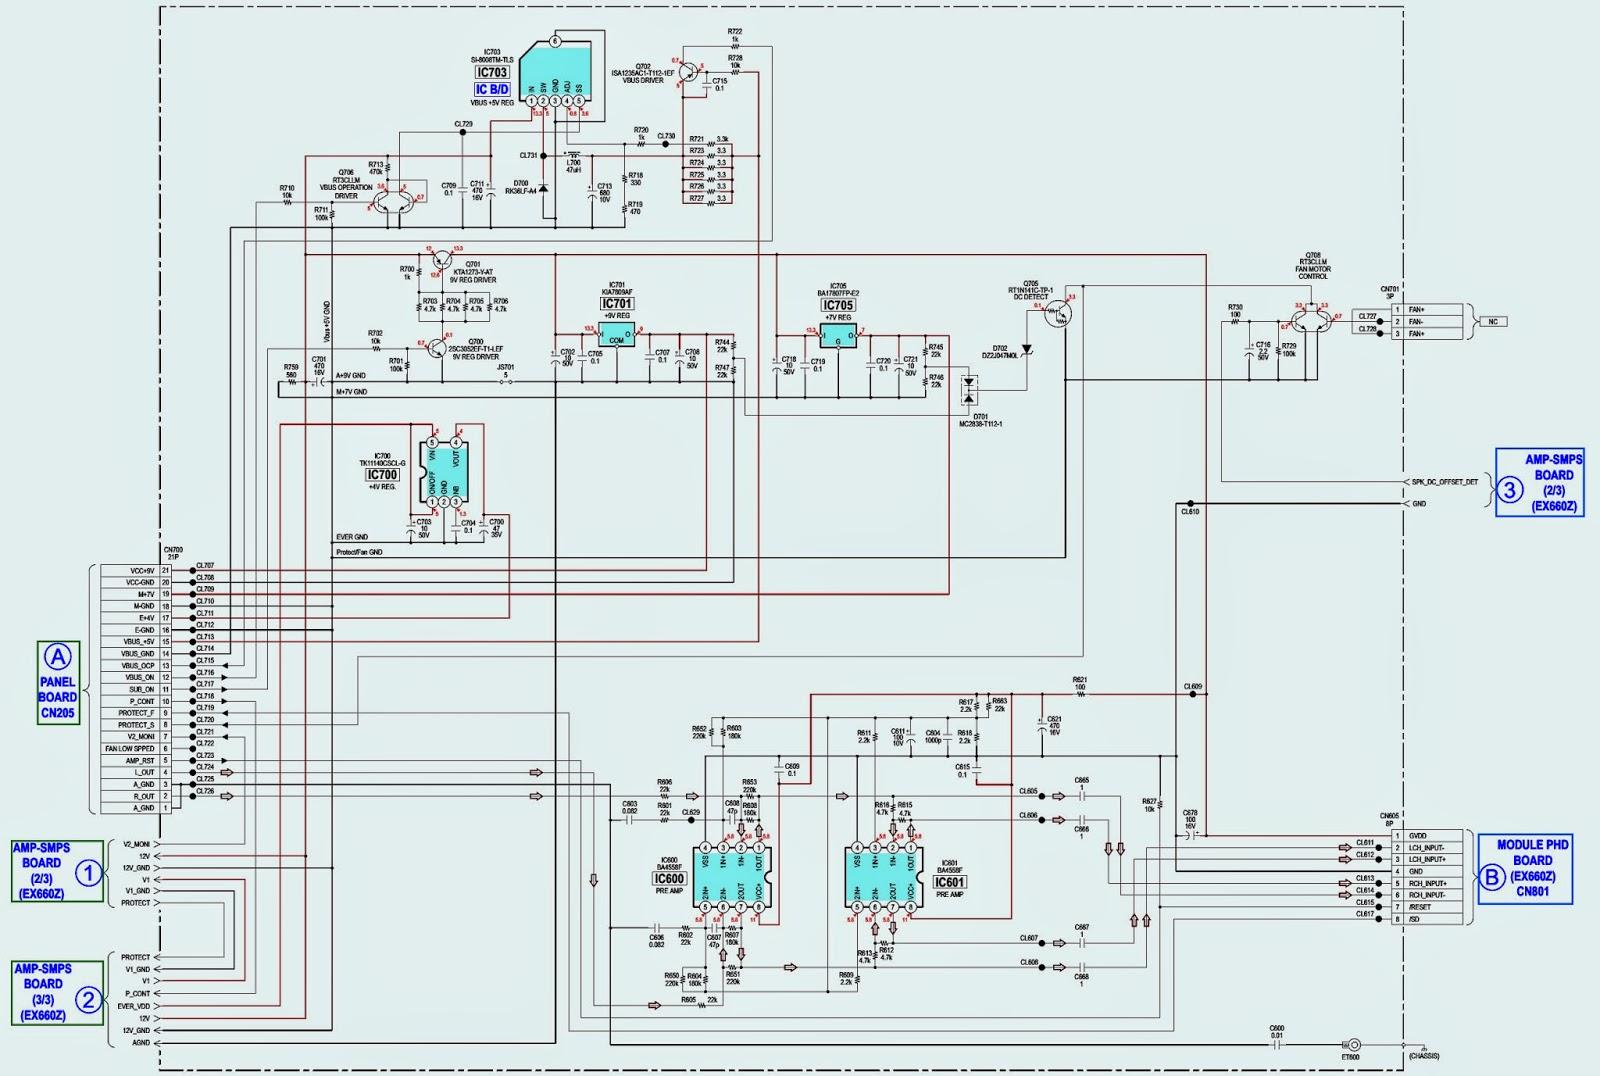 ev eliminator wiring diagram wiring library rh 22 budoshop4you de ev battery boxes ev warrior wiring [ 1600 x 1076 Pixel ]